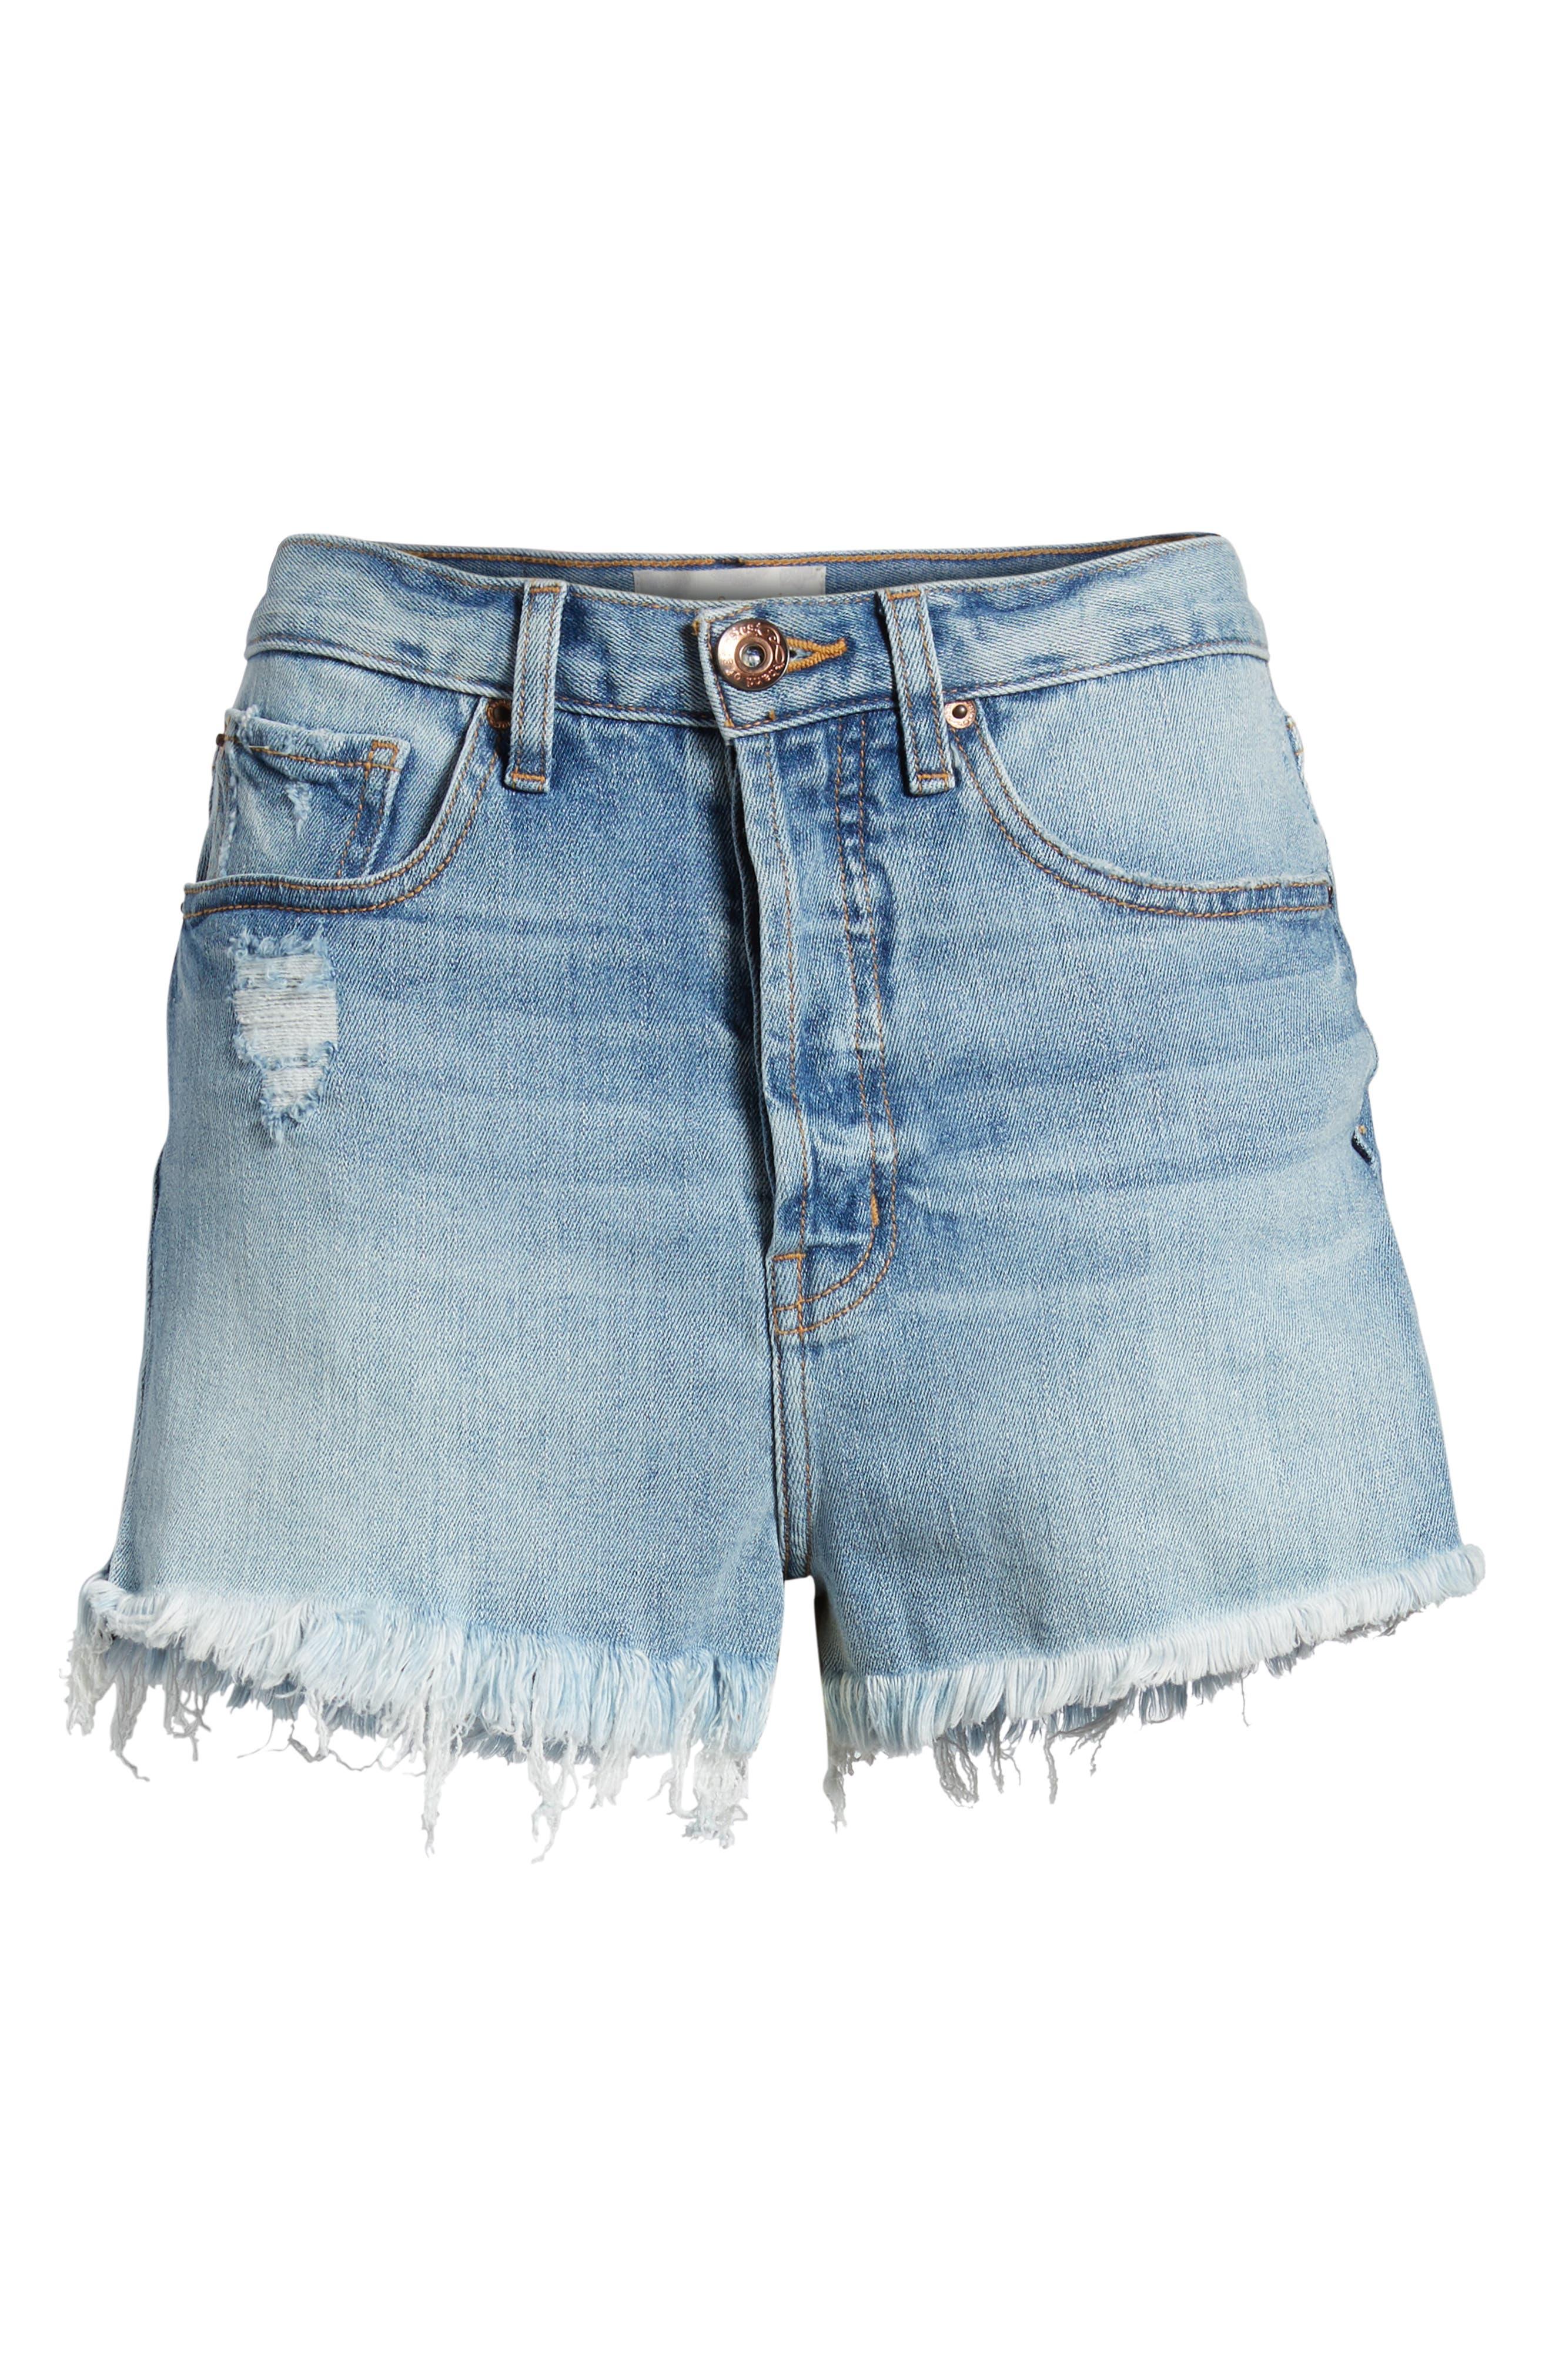 Zoey Denim Shorts,                             Alternate thumbnail 7, color,